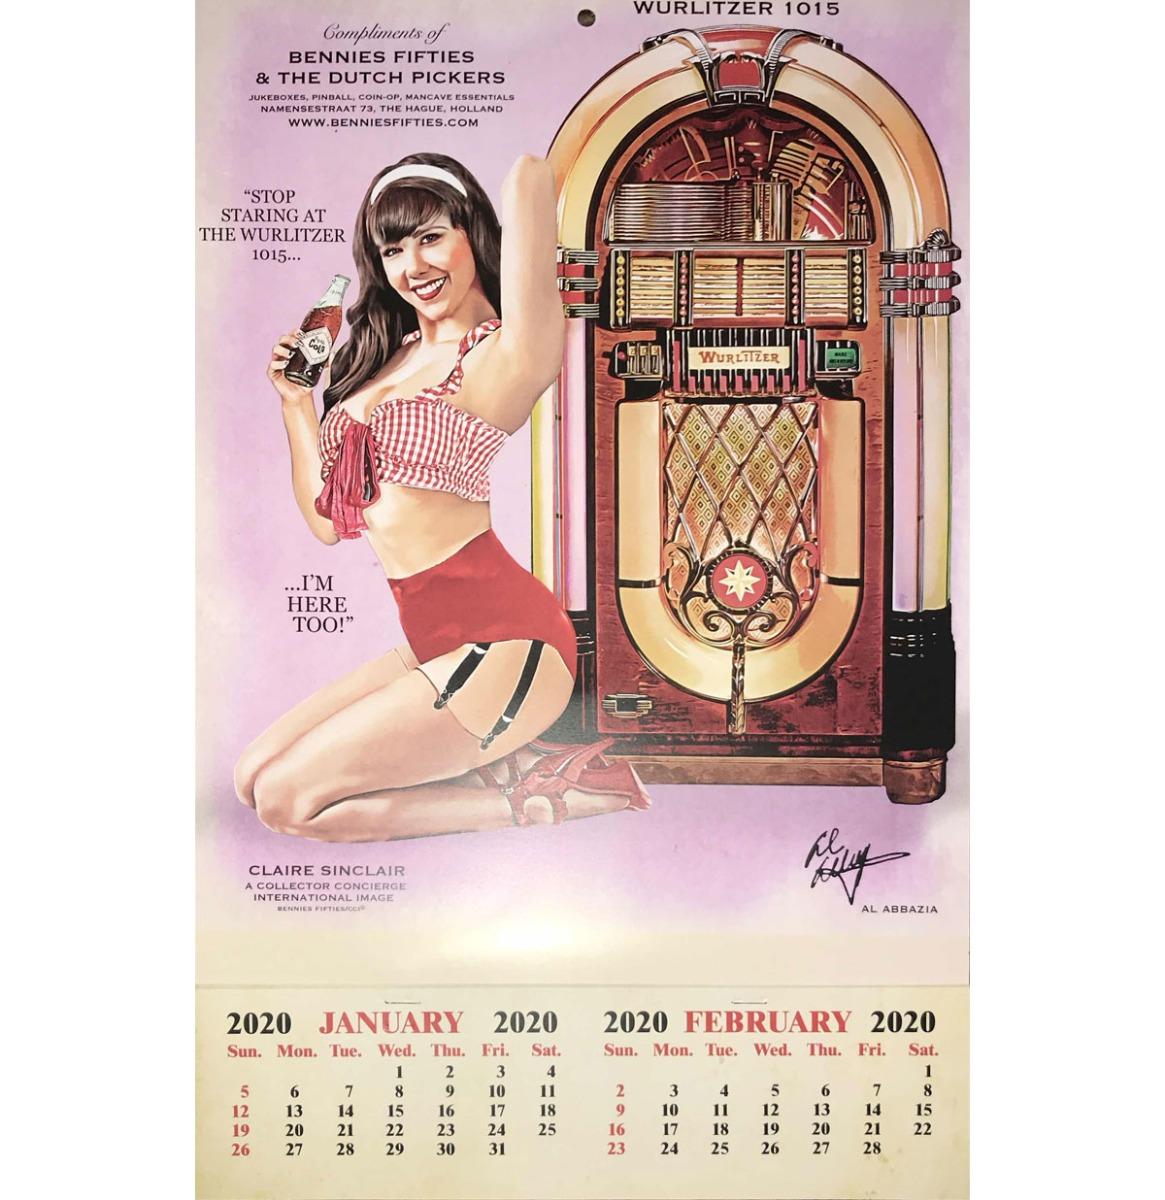 2020 Kalender Wurlitzer 1015 Jukebox Pin Up Bennies Fifties - PRE-ORDER